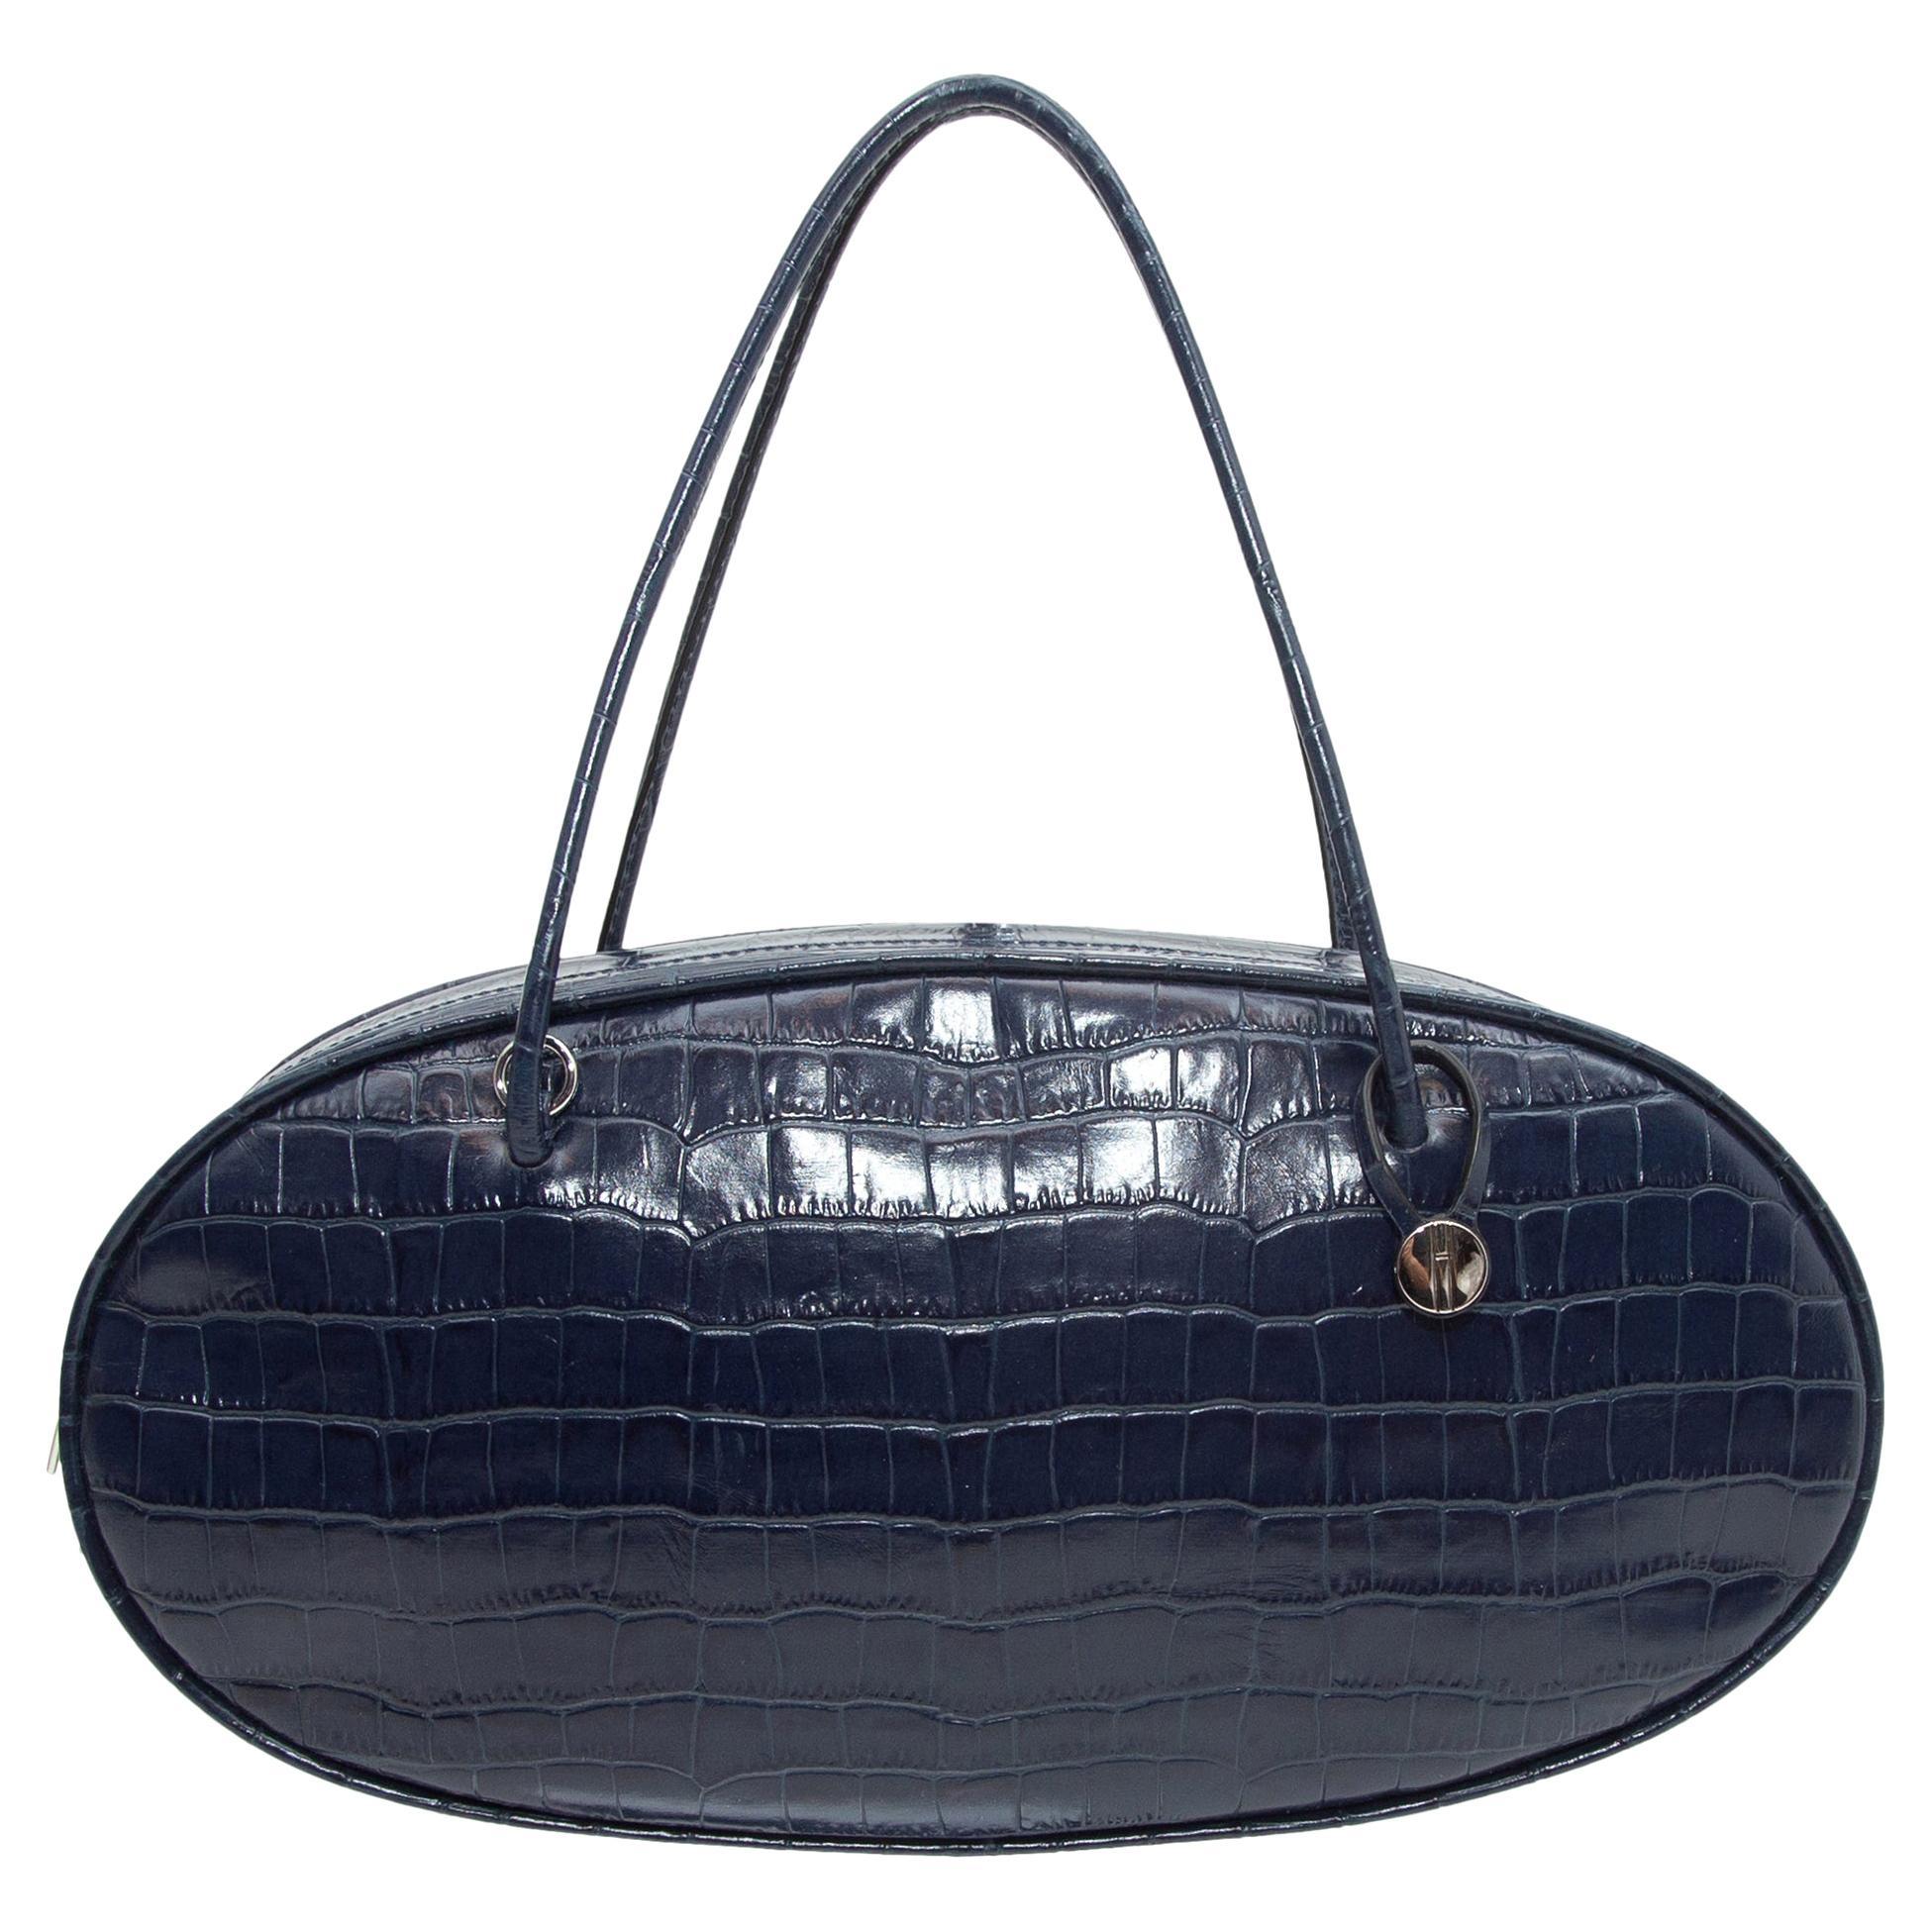 Hayward Navy Embossed Leather Oval Handbag